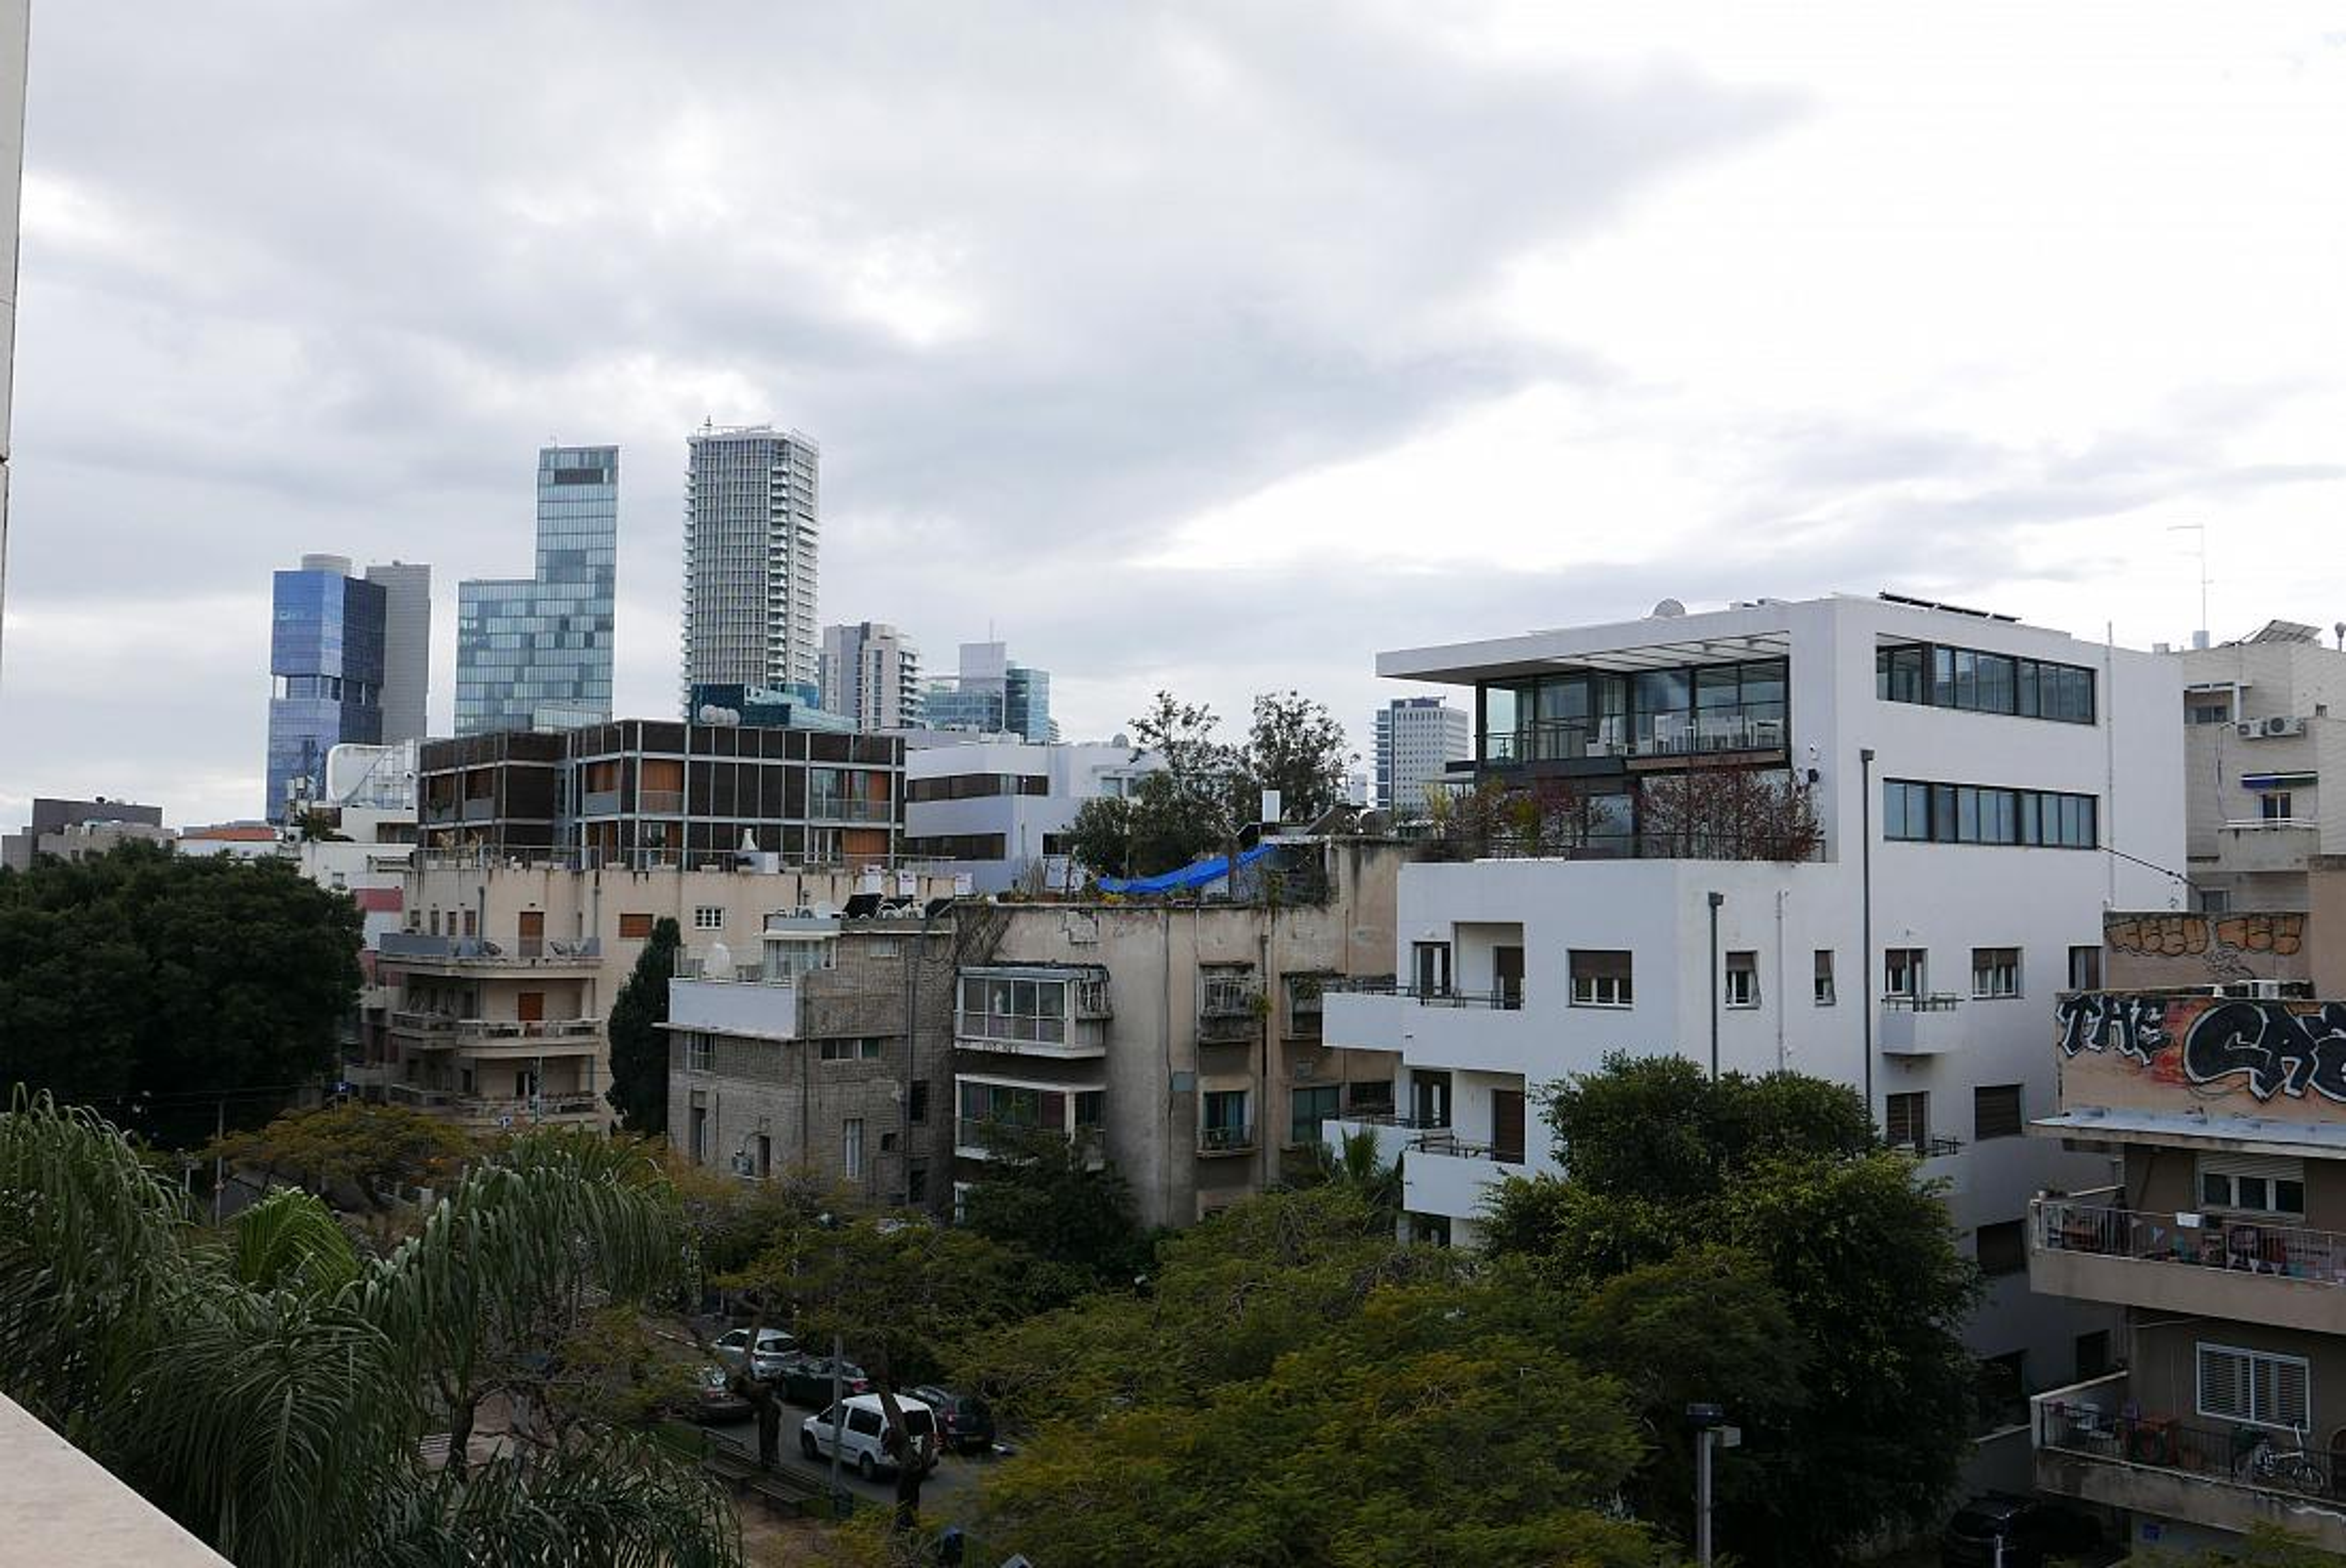 Vue de la terrasse for Vue terrasse